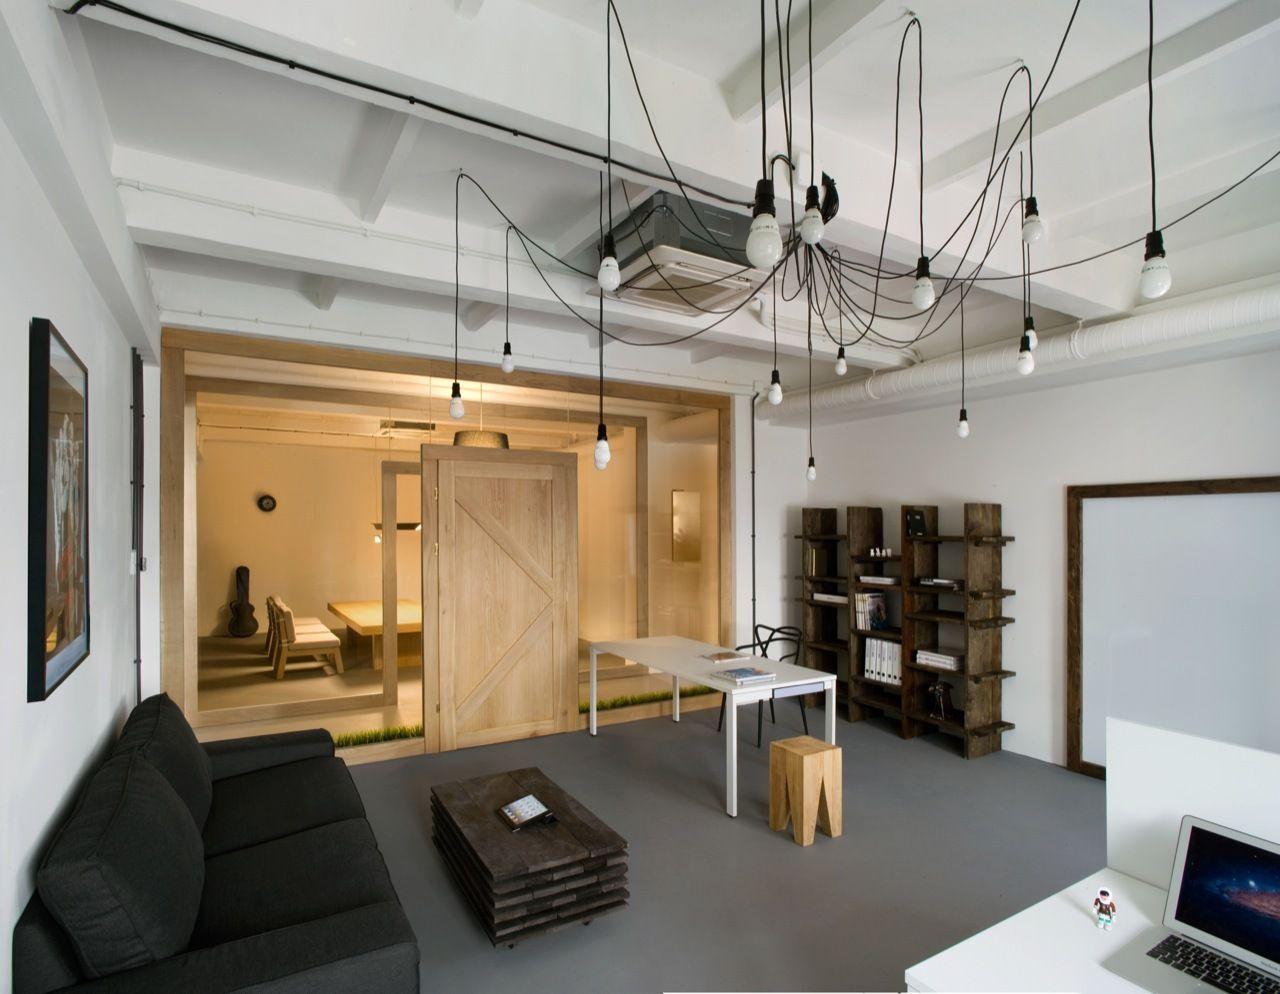 Office interior - pendant lights, shelving, table.